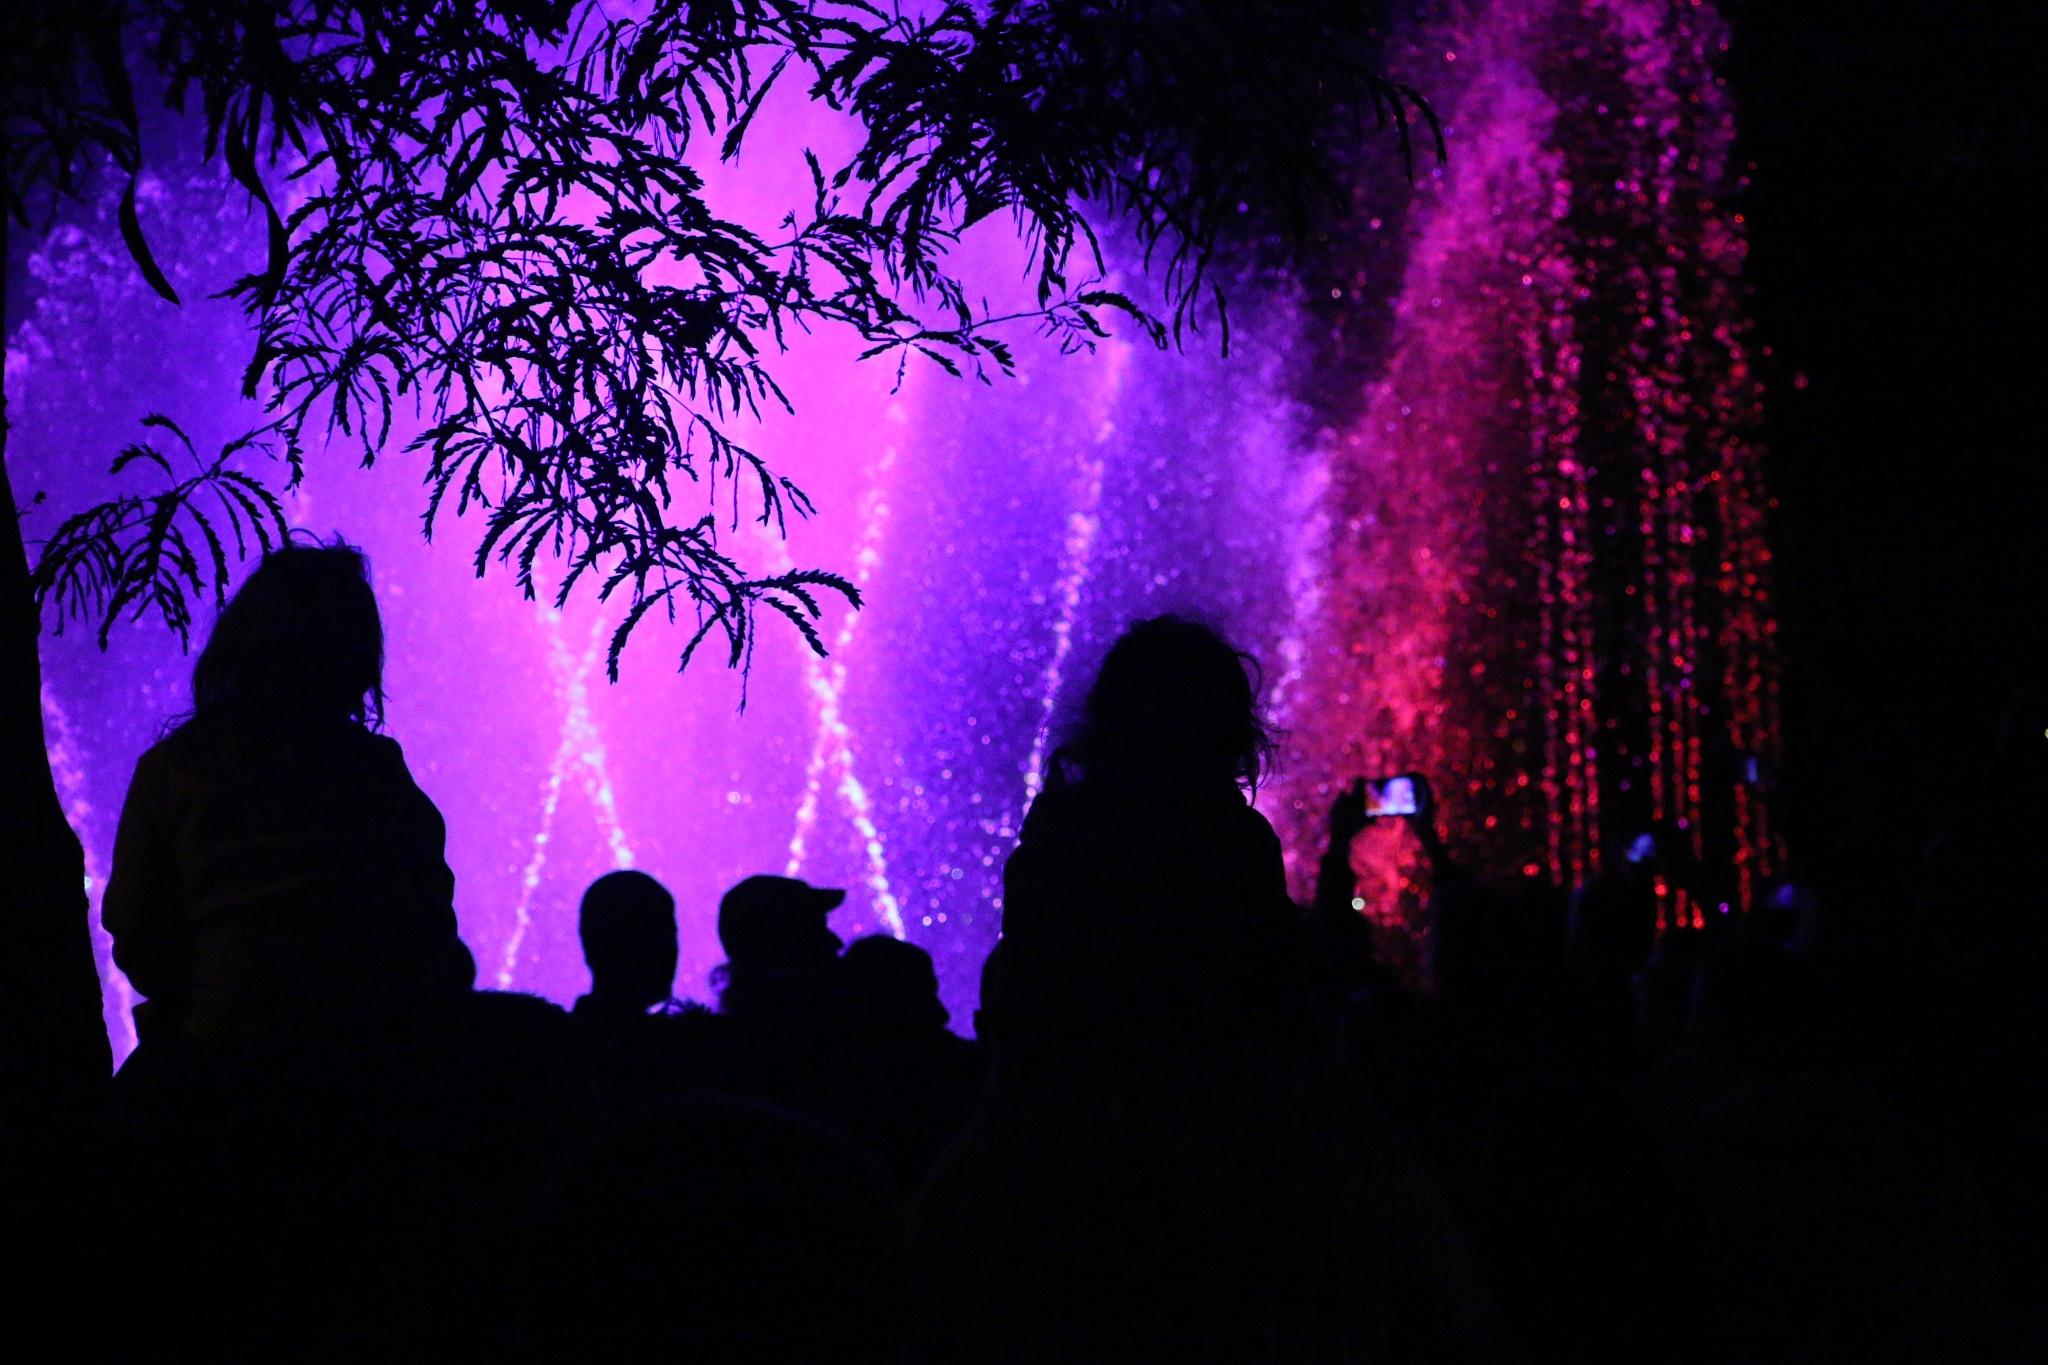 Light Festival in Jerusalem by Serge